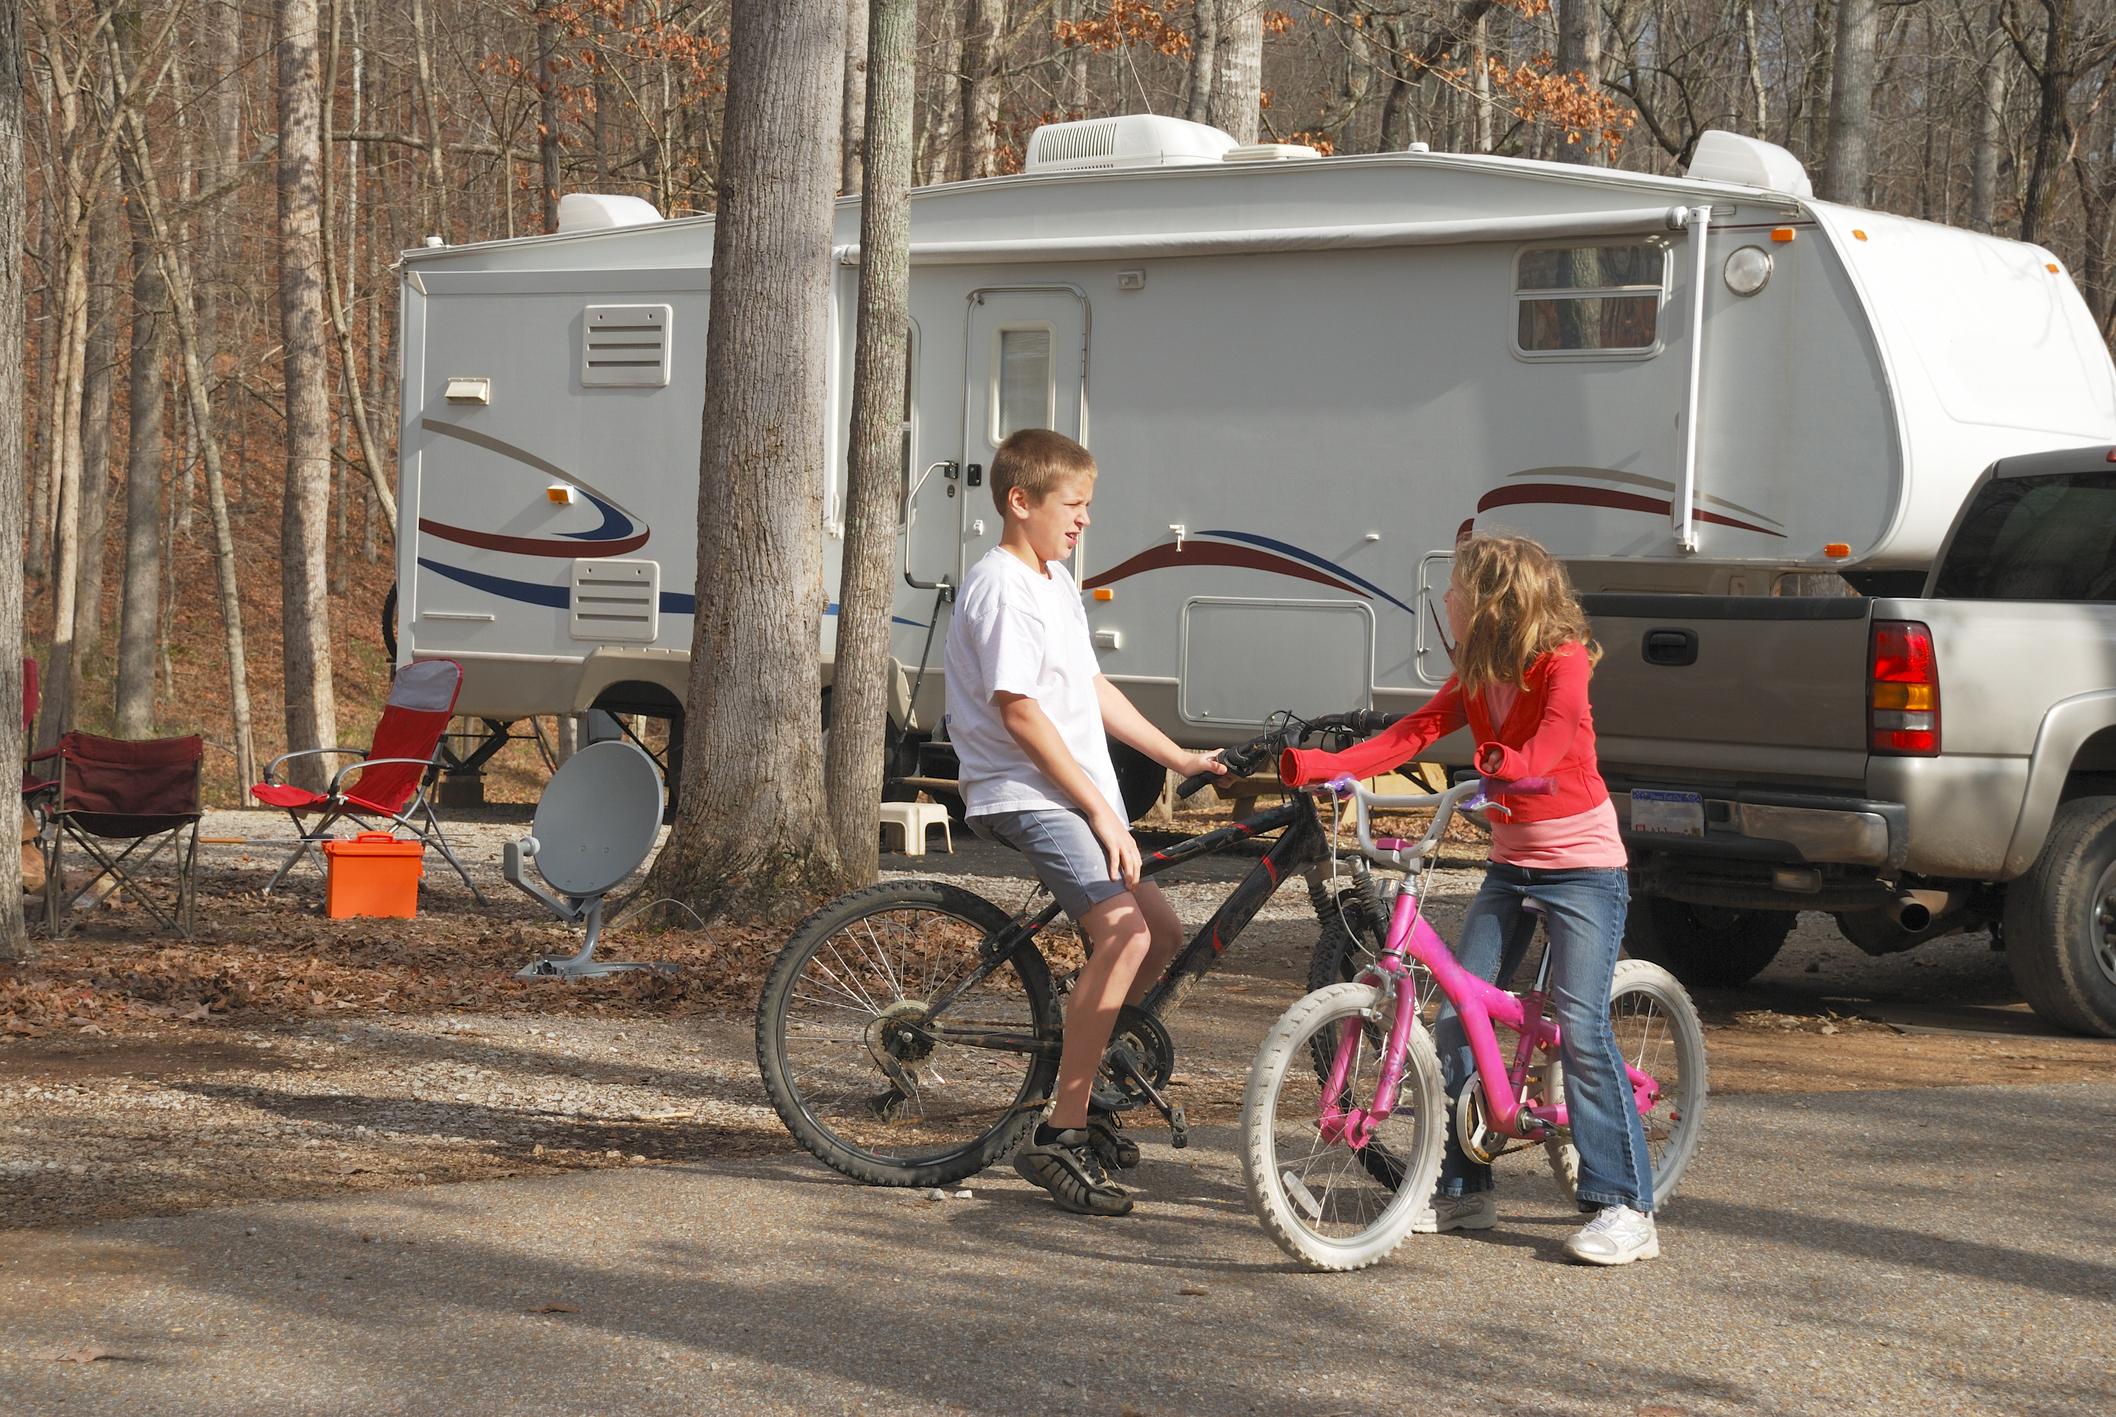 Lifestyle Caravan Hire Business – UNDER CONTRACT